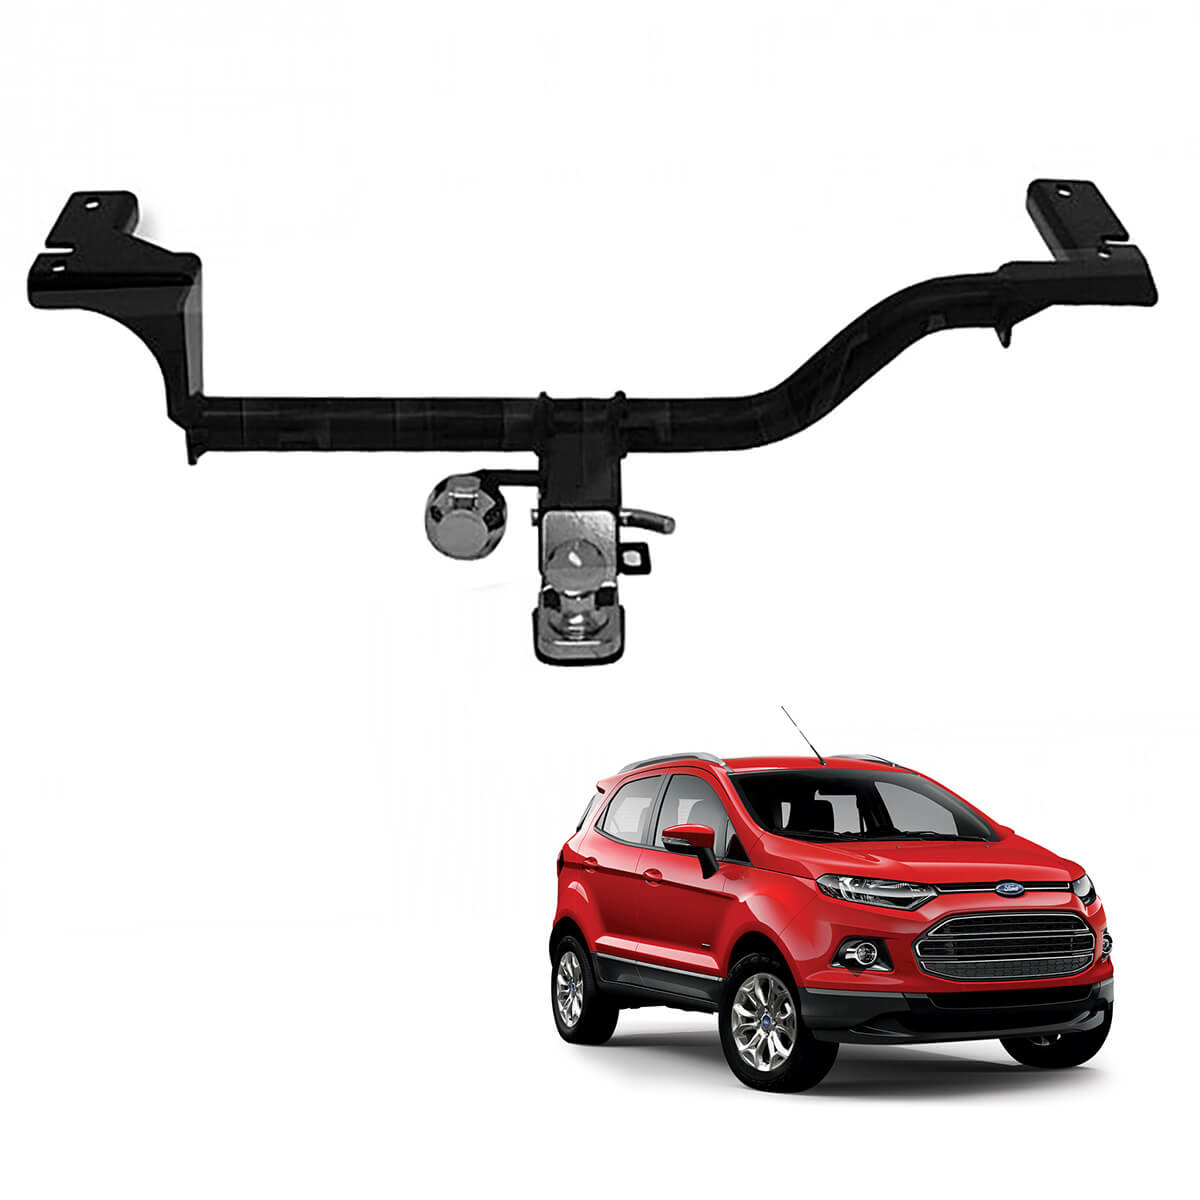 Engate para reboque Ford Ecosport 2012 á 2019